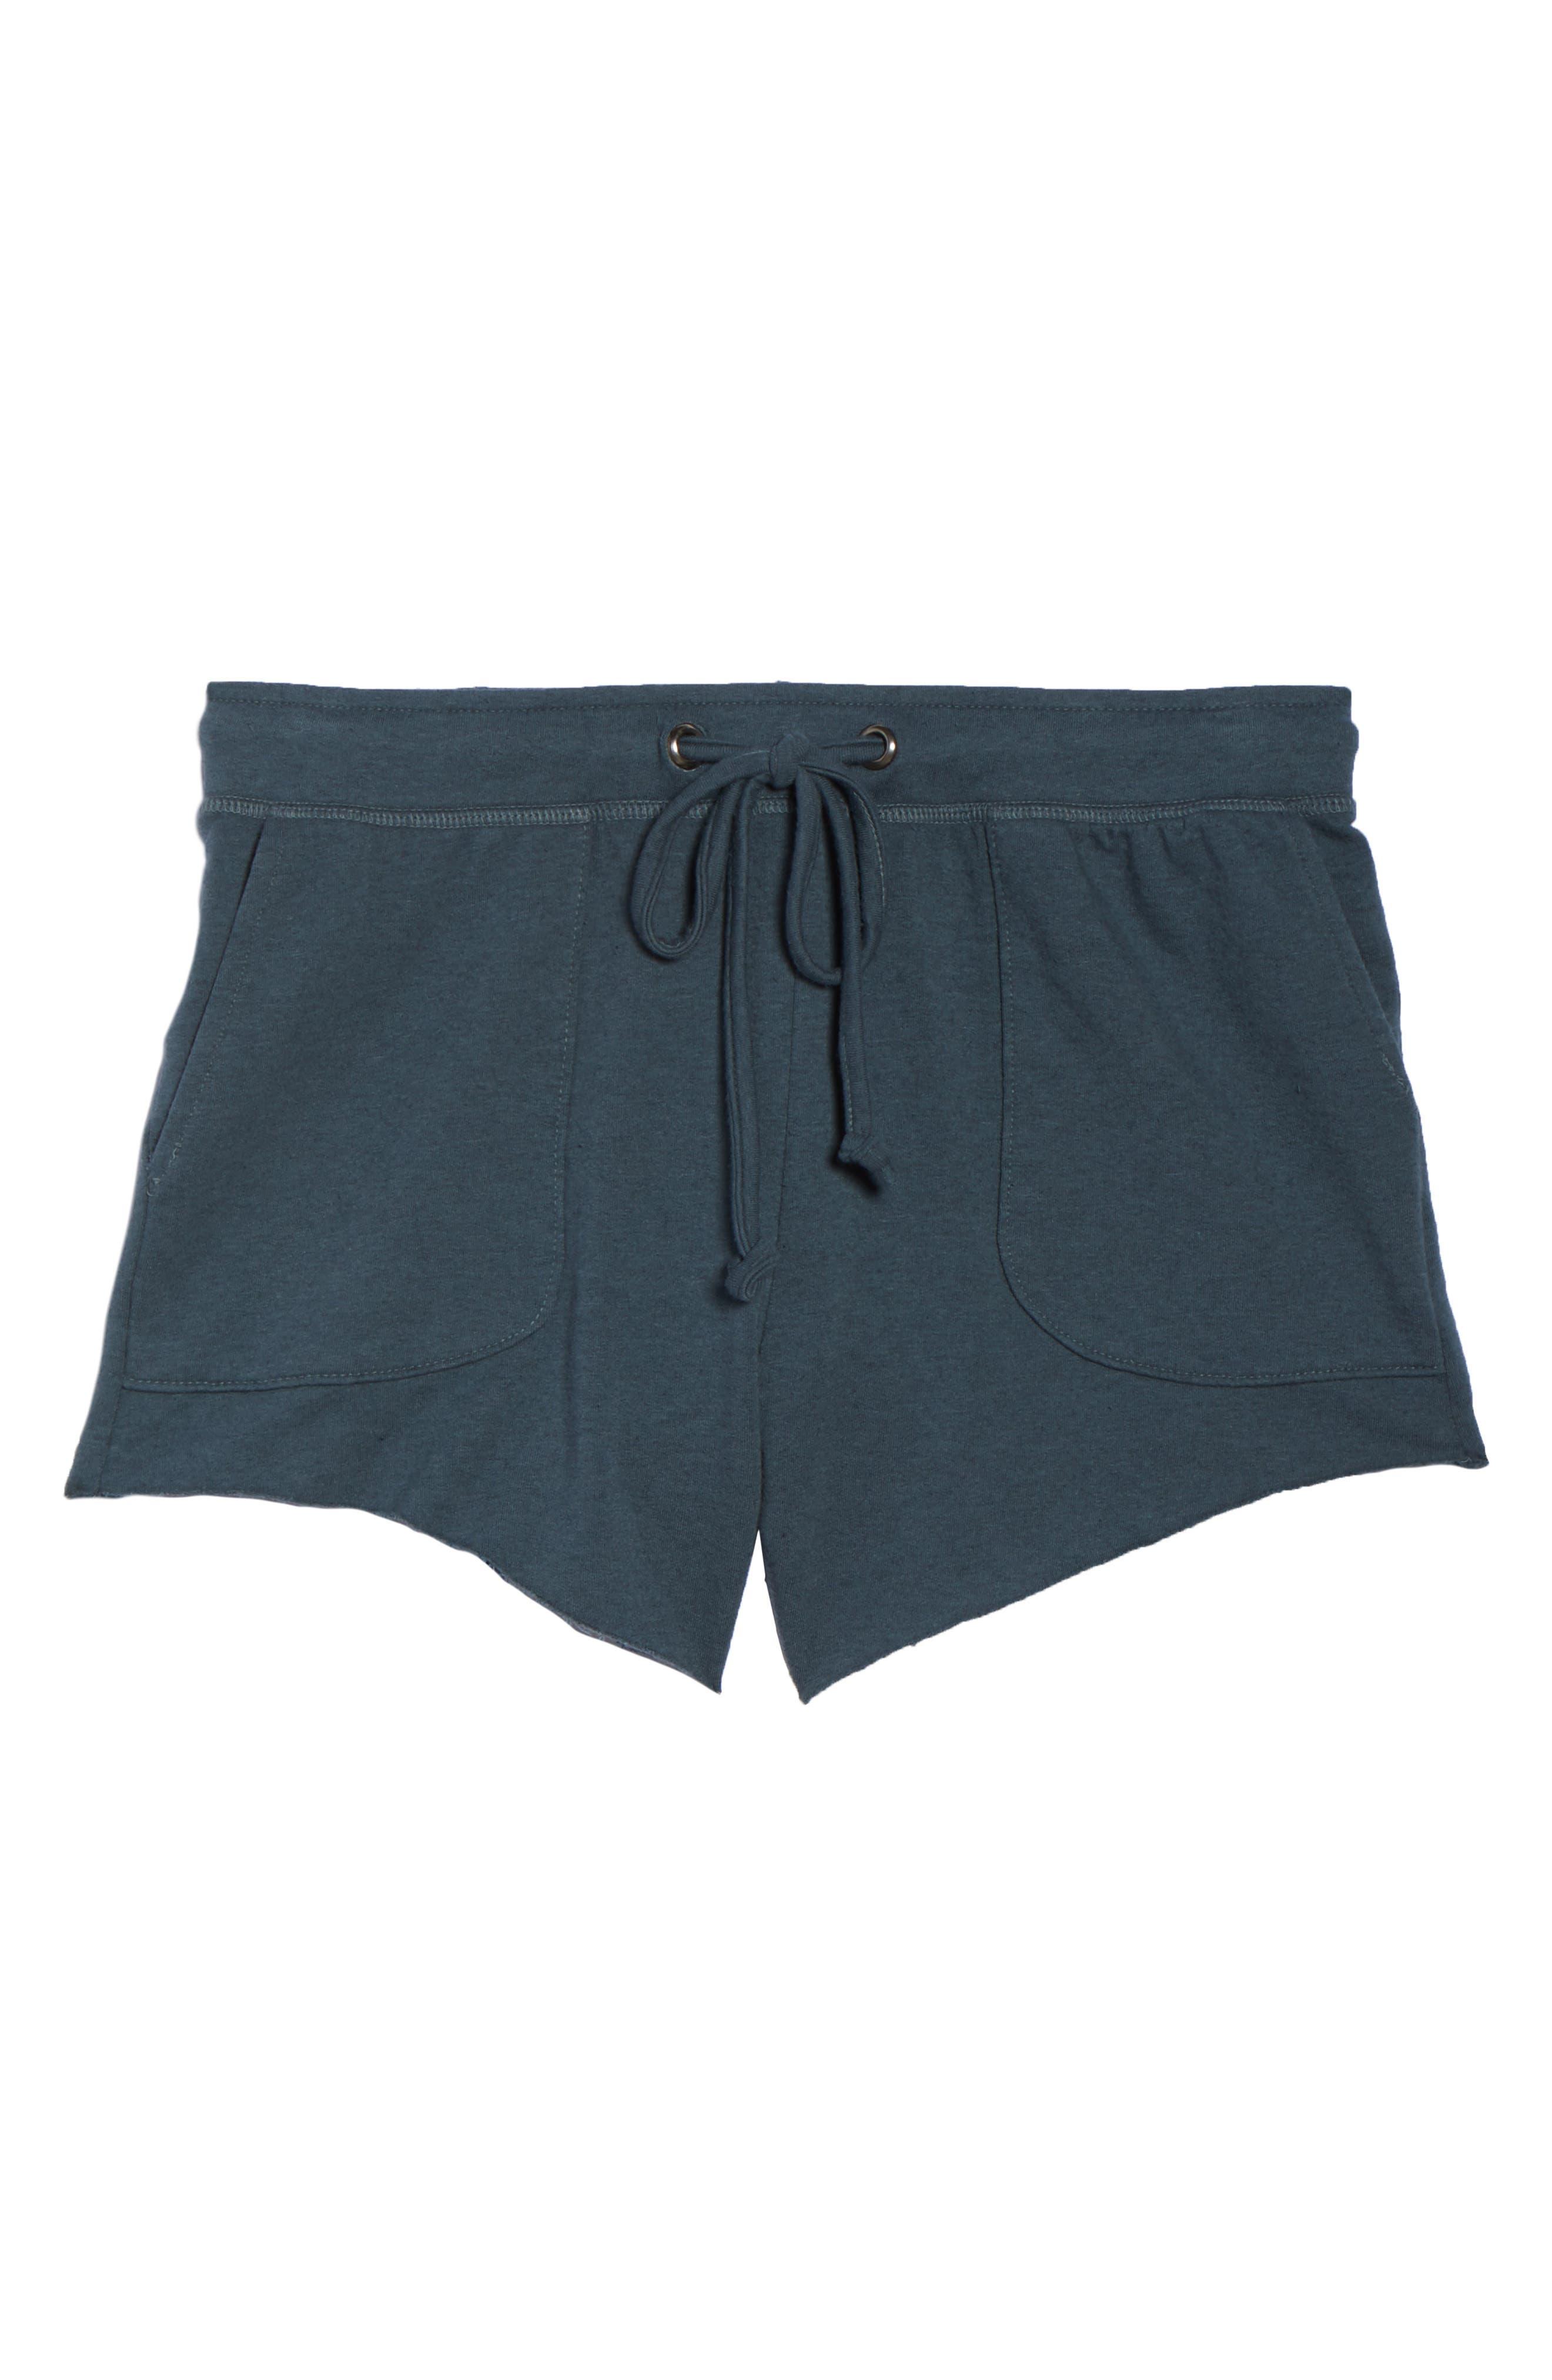 Raw Cut Lounge Shorts,                             Alternate thumbnail 4, color,                             Gunmetal